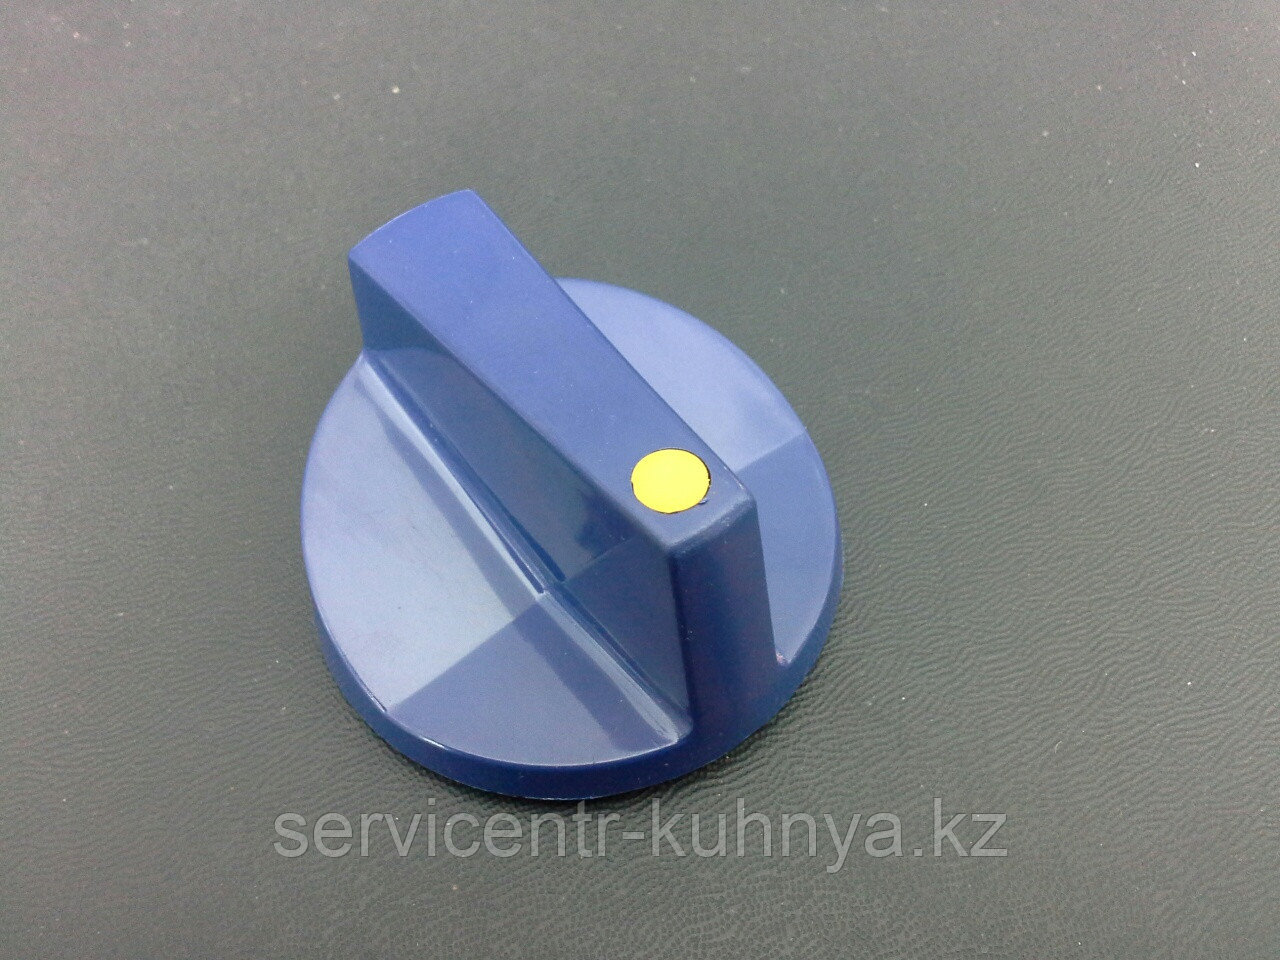 Ручка луна ЭПК-27Н.00.00.003-02